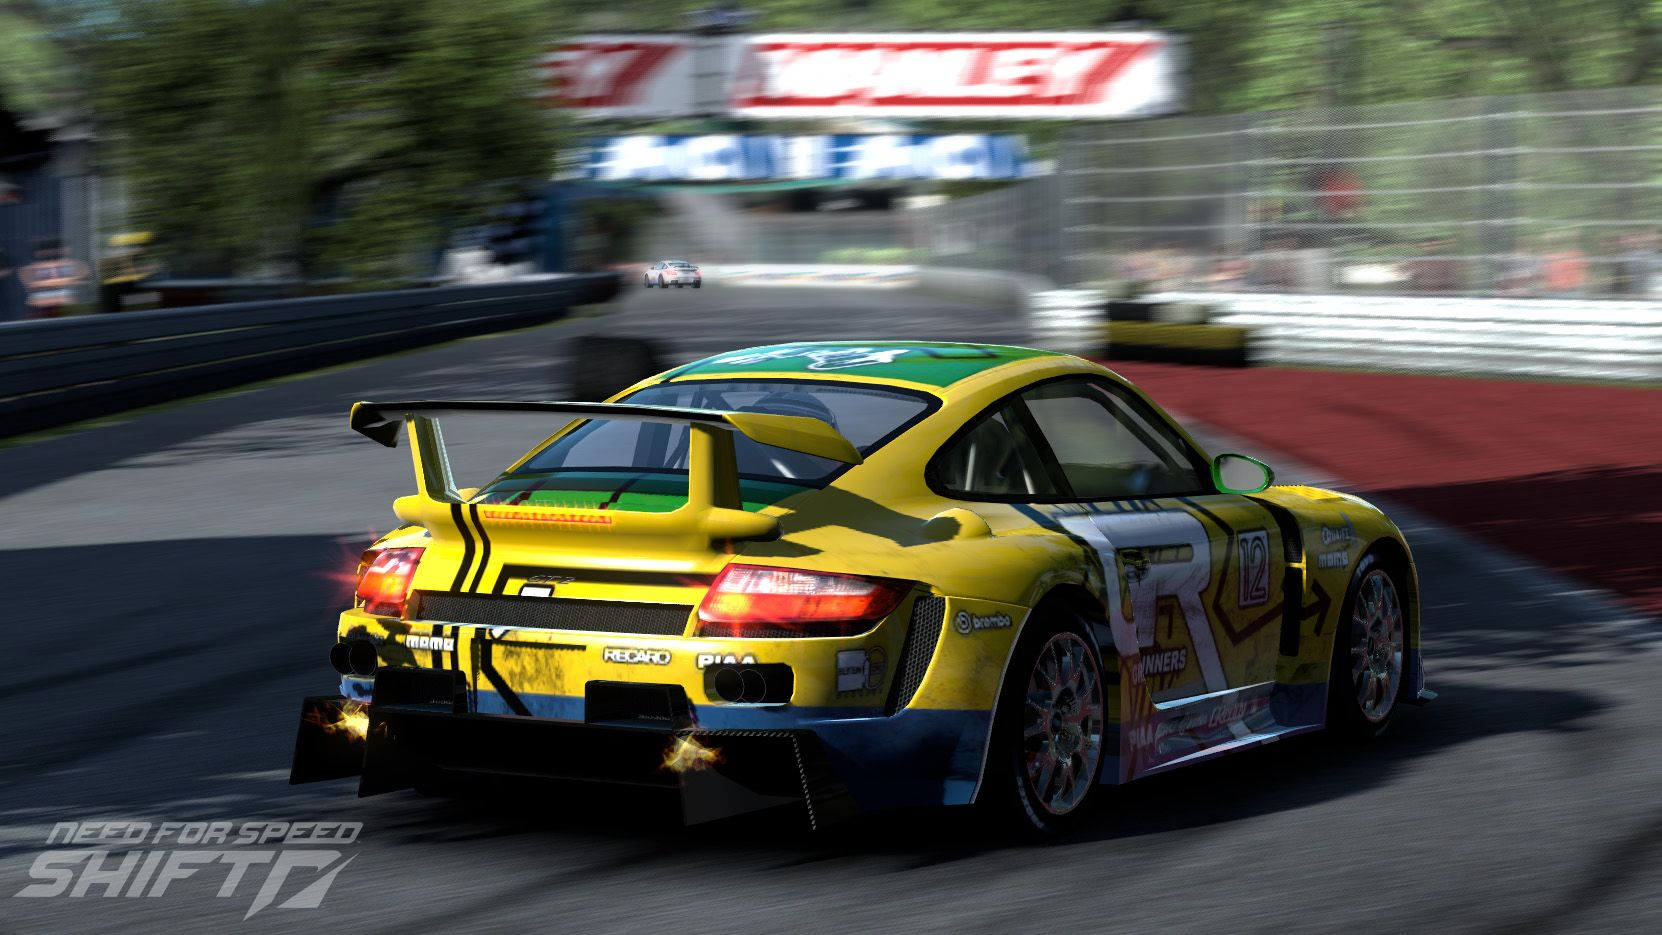 Новый need for speed — это project gotham racing с